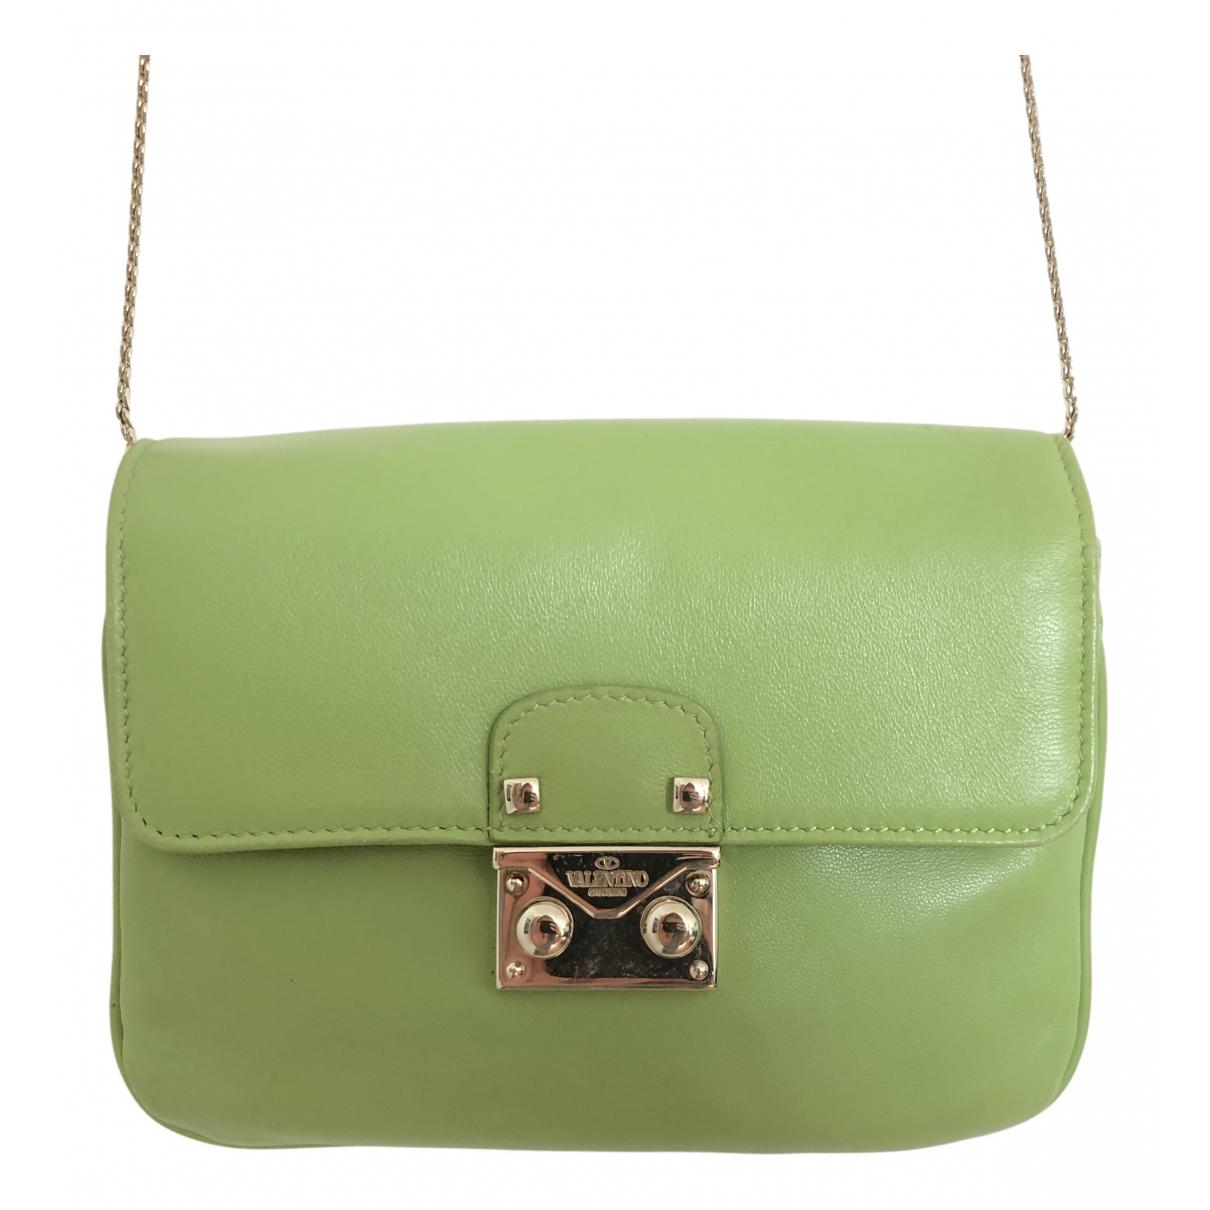 Valentino Garavani \N Green Leather handbag for Women \N